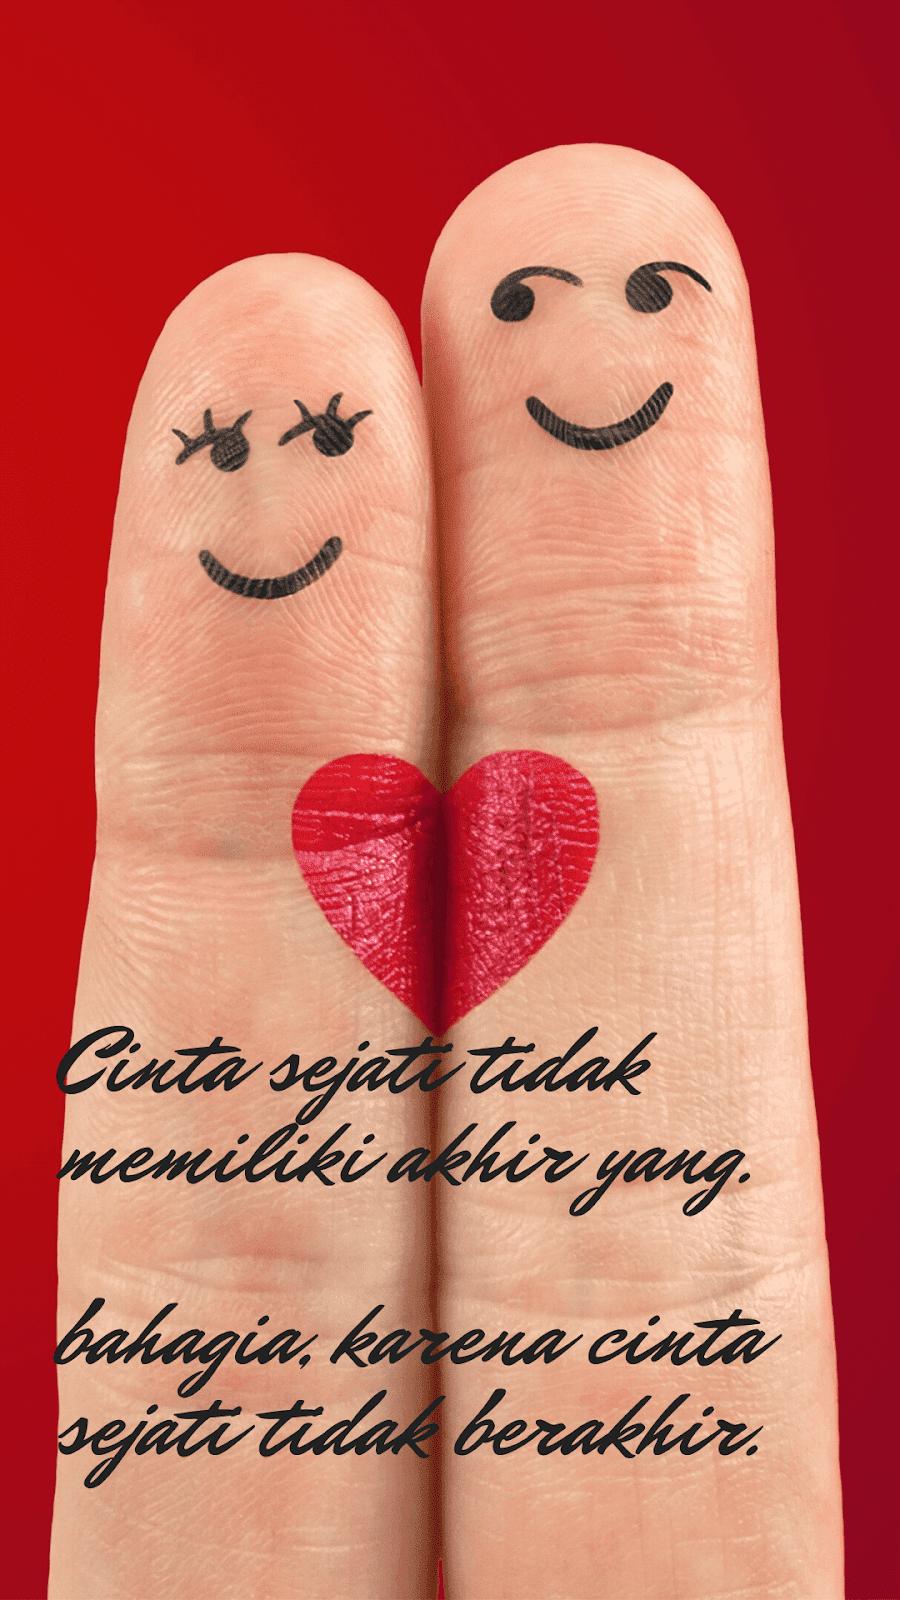 20 Kata kata cinta romantis penuh inspirasi buat status whatsapp caption dll